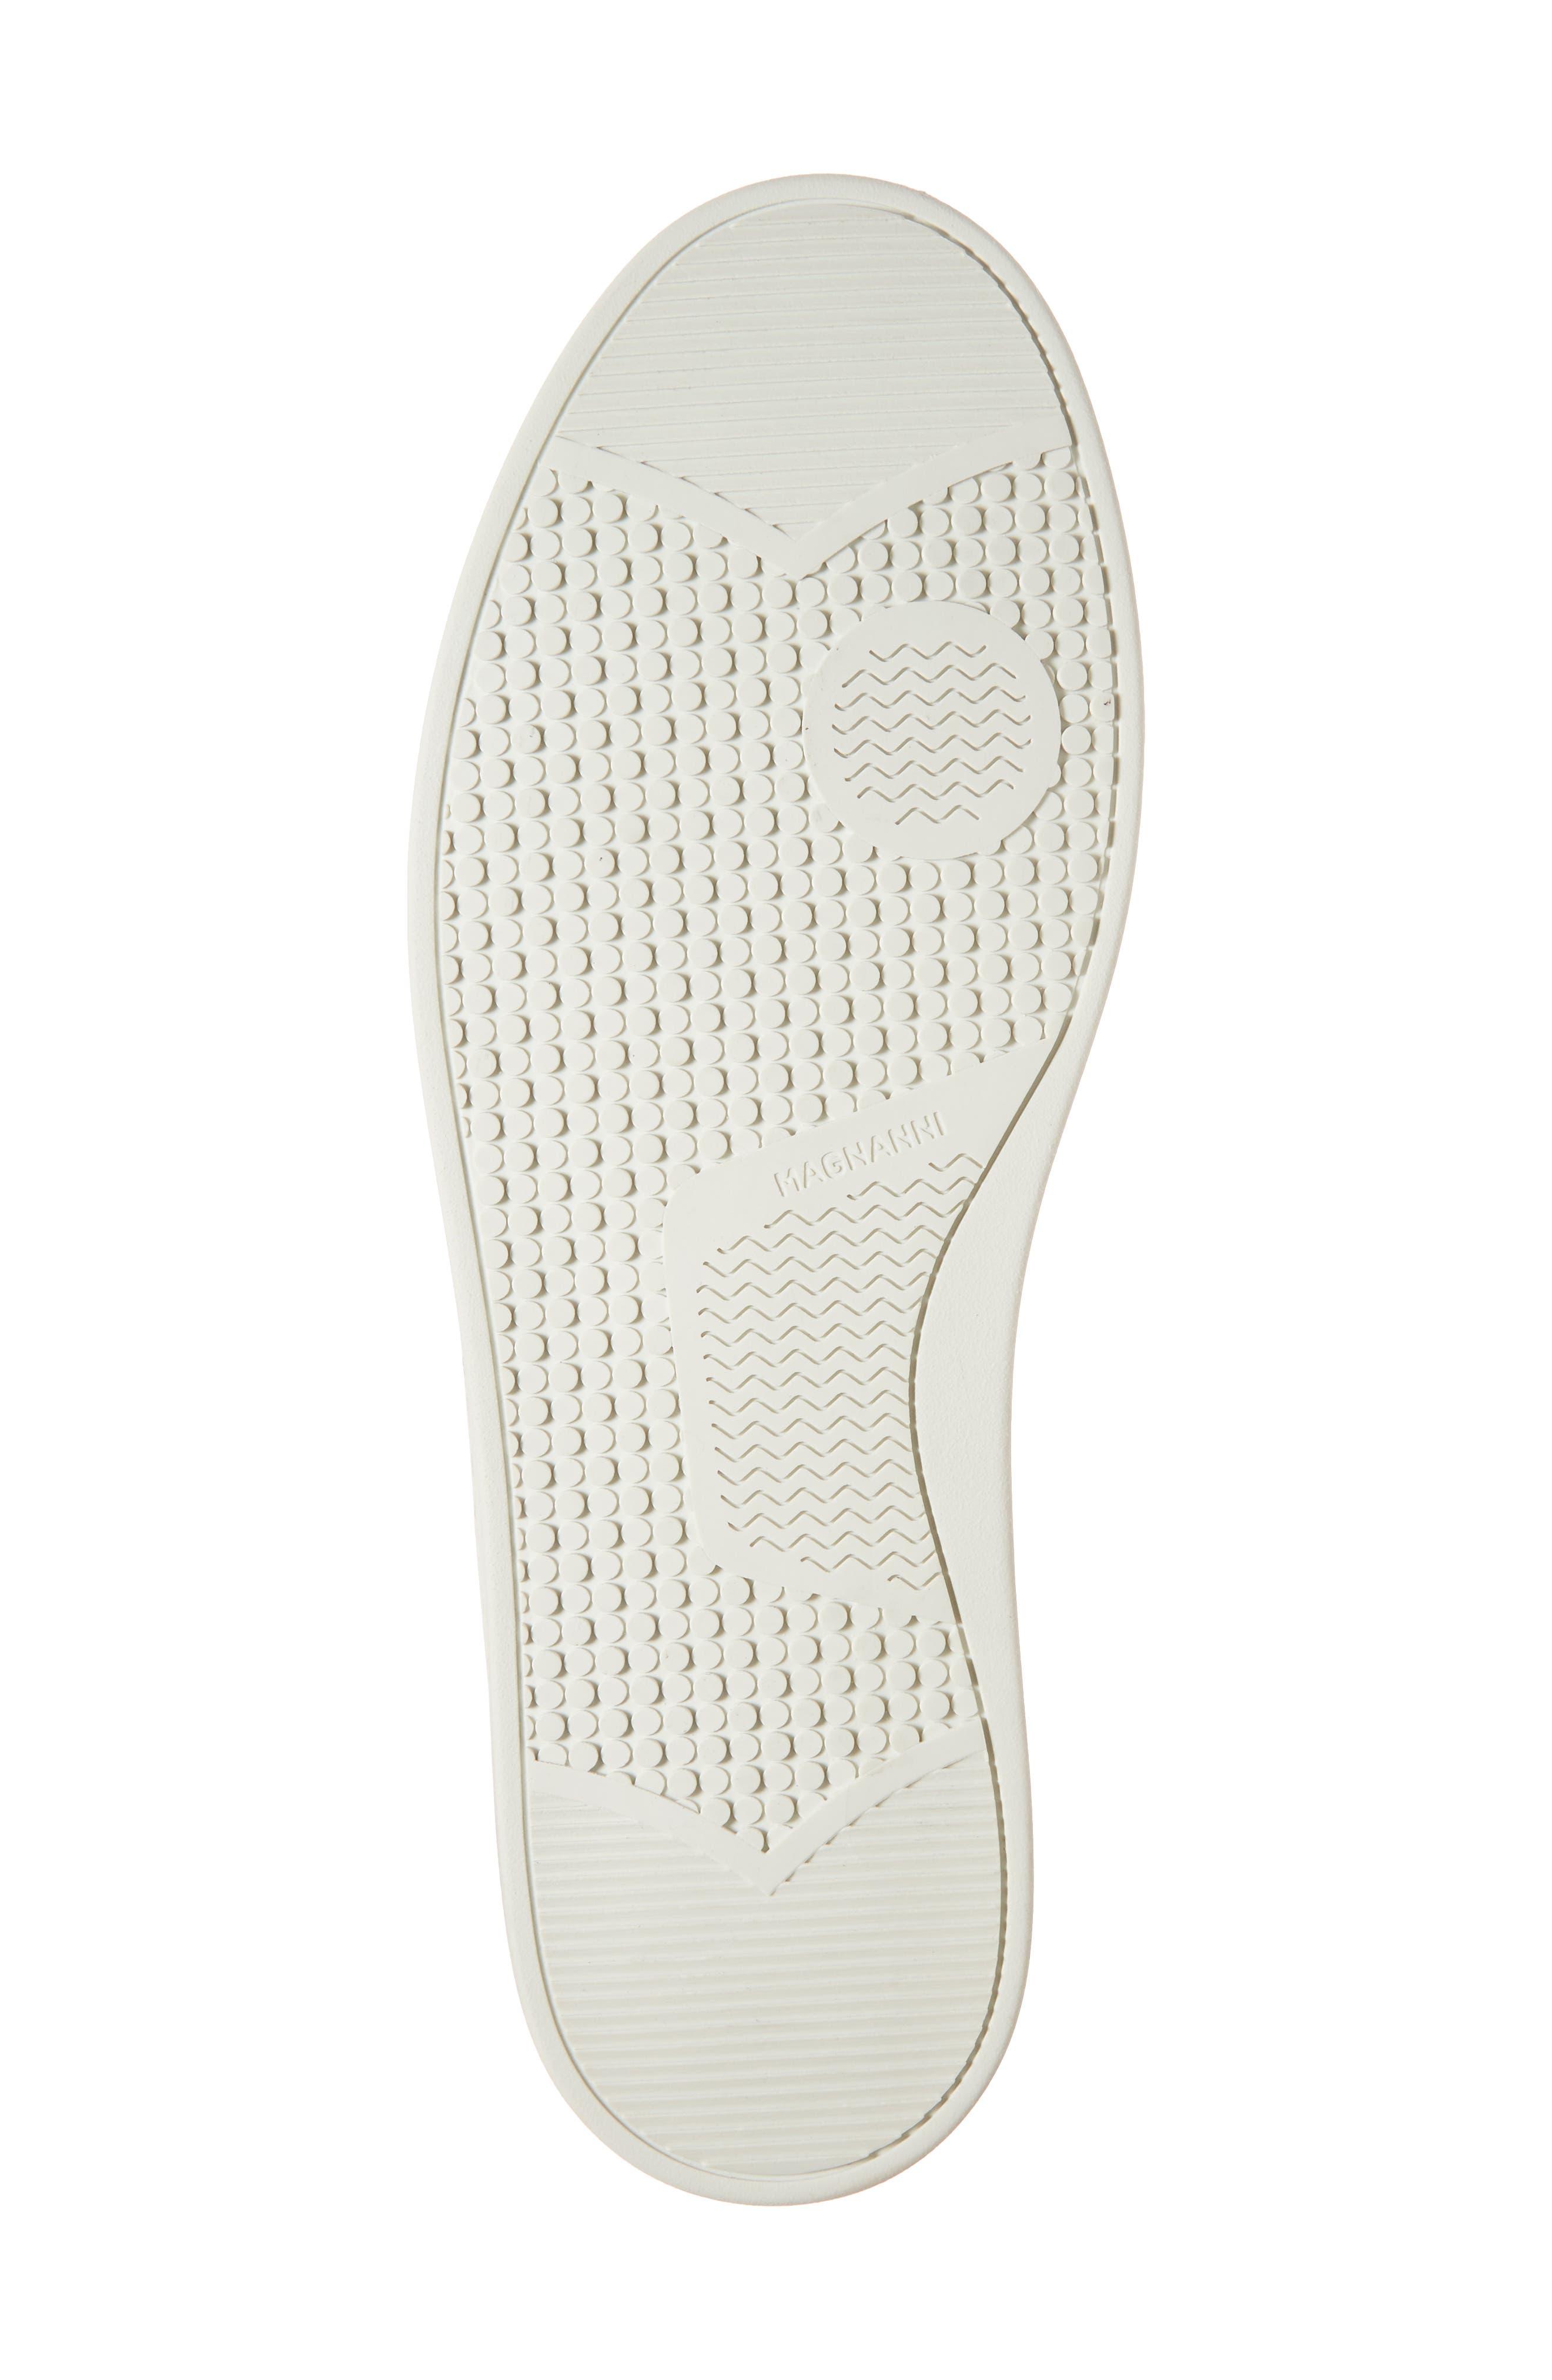 Juniper Brogued Low Top Sneaker,                             Alternate thumbnail 6, color,                             Grey Leather